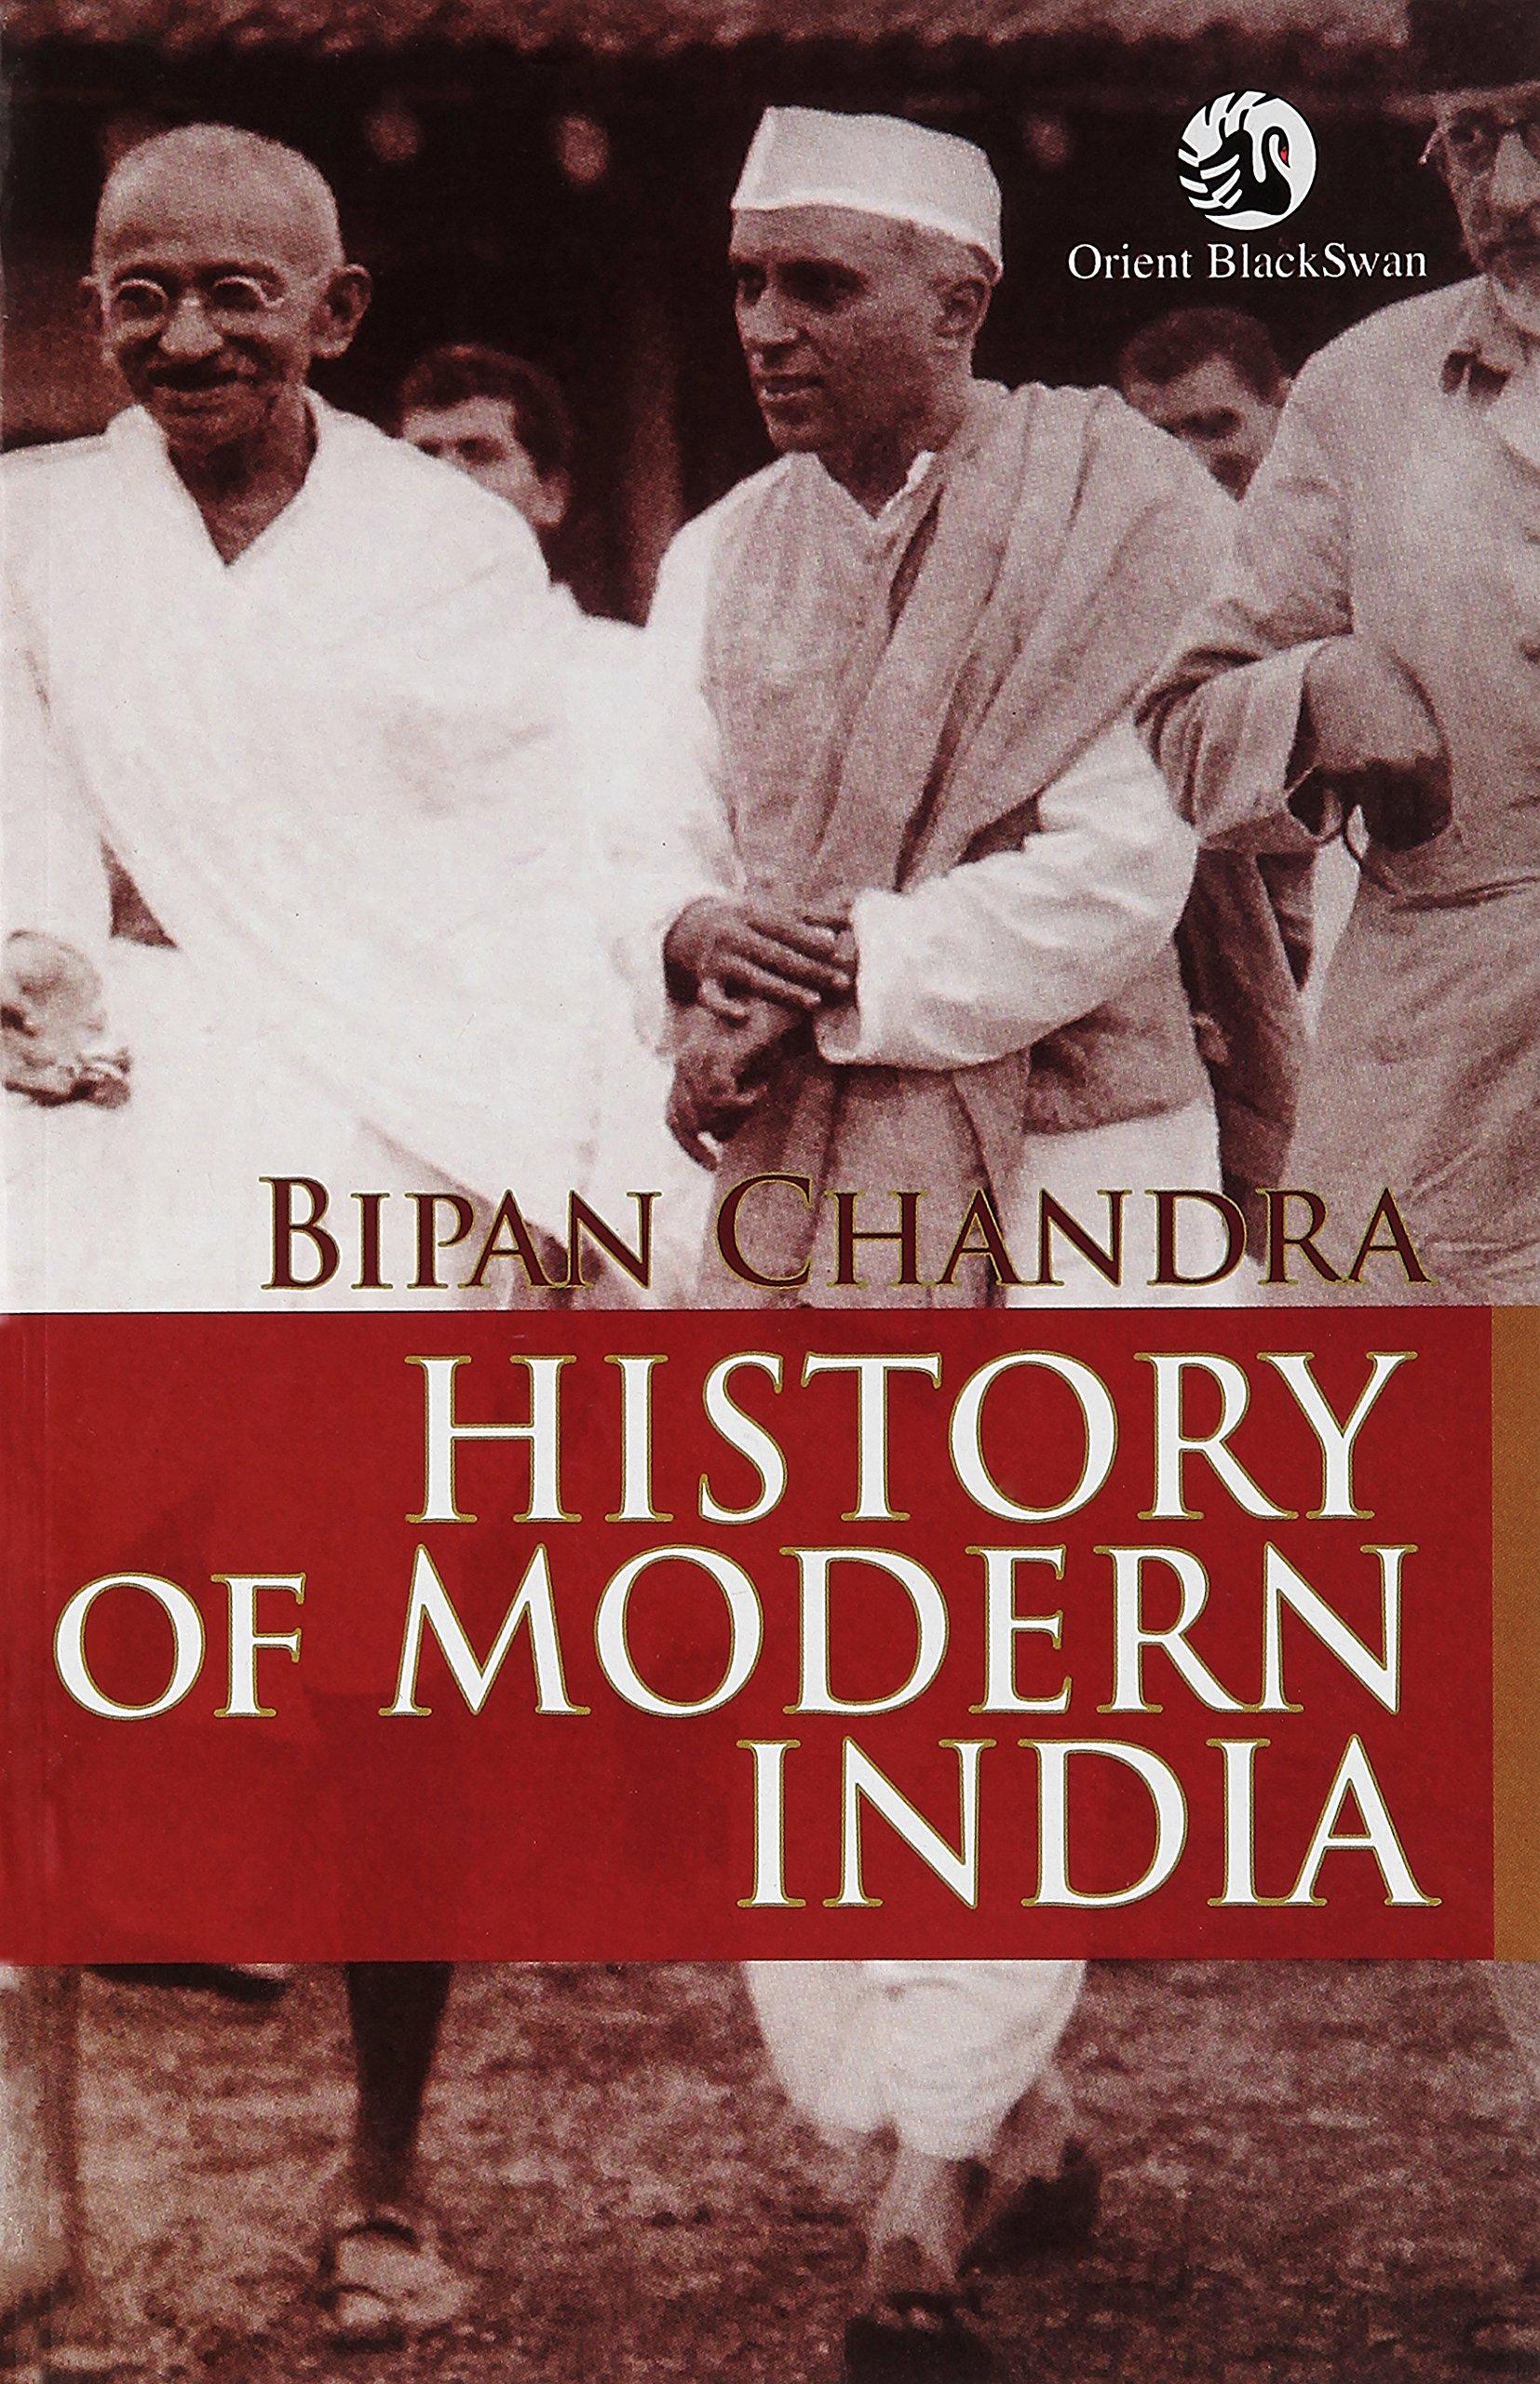 Modern Indian History by Bipin Chandra